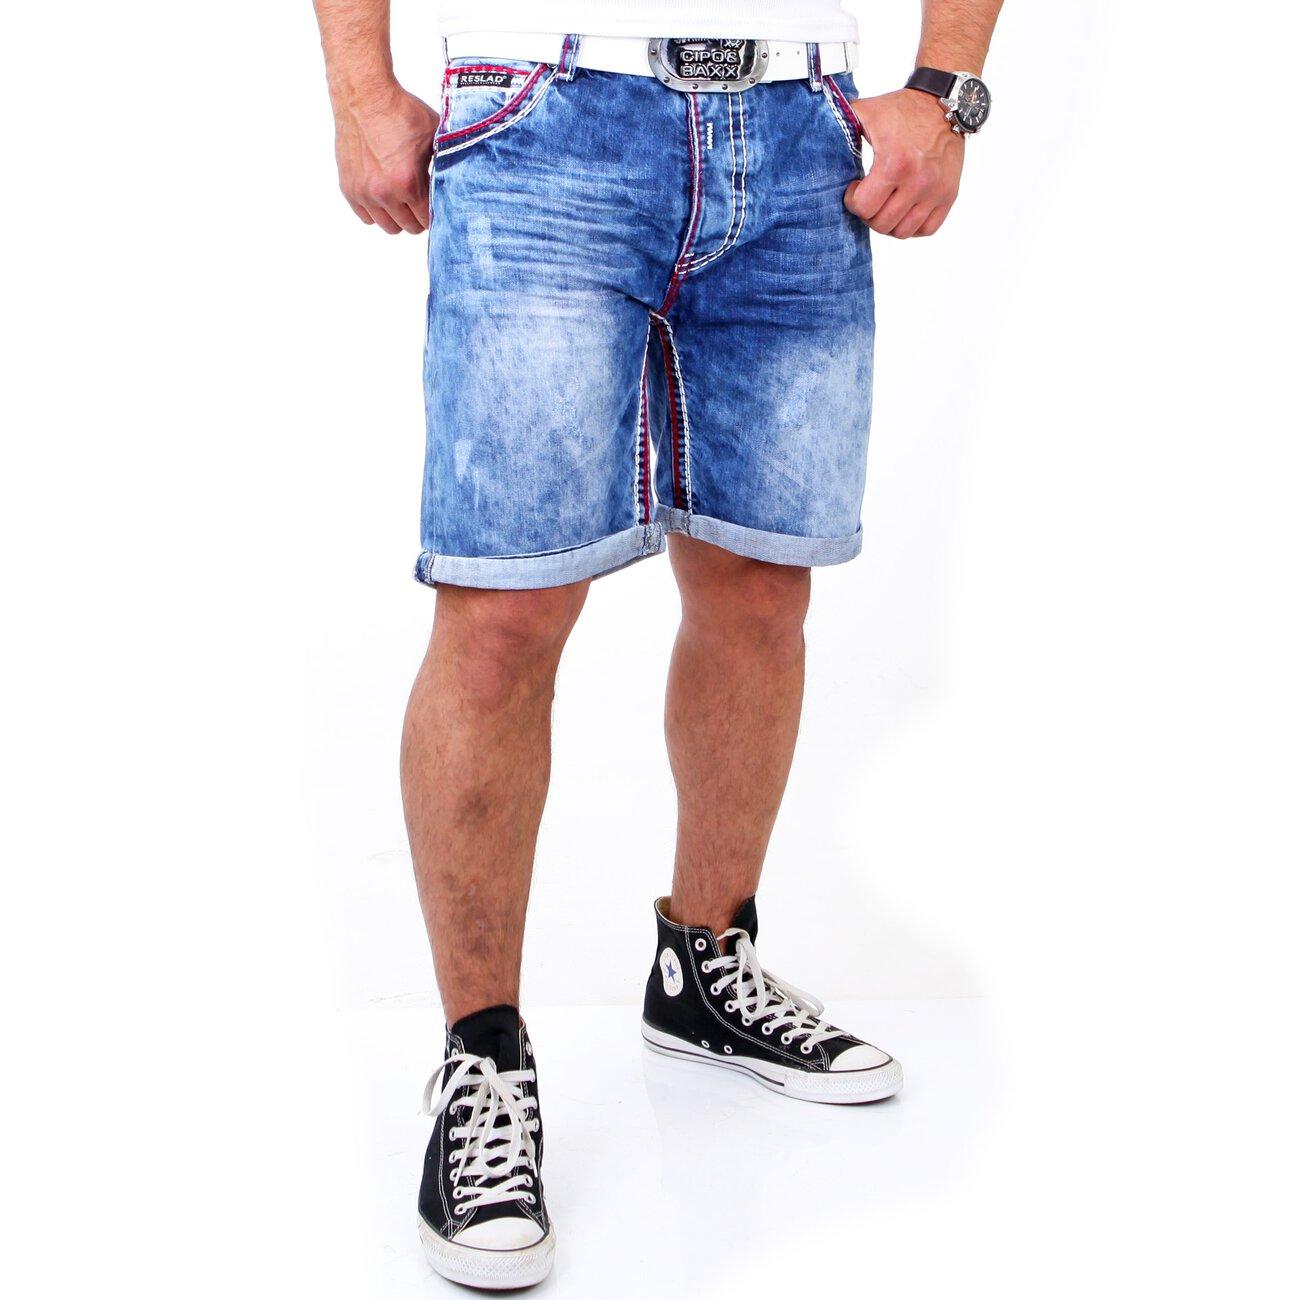 jeans shorts mit dicken n hten reslad jeans bermuda. Black Bedroom Furniture Sets. Home Design Ideas